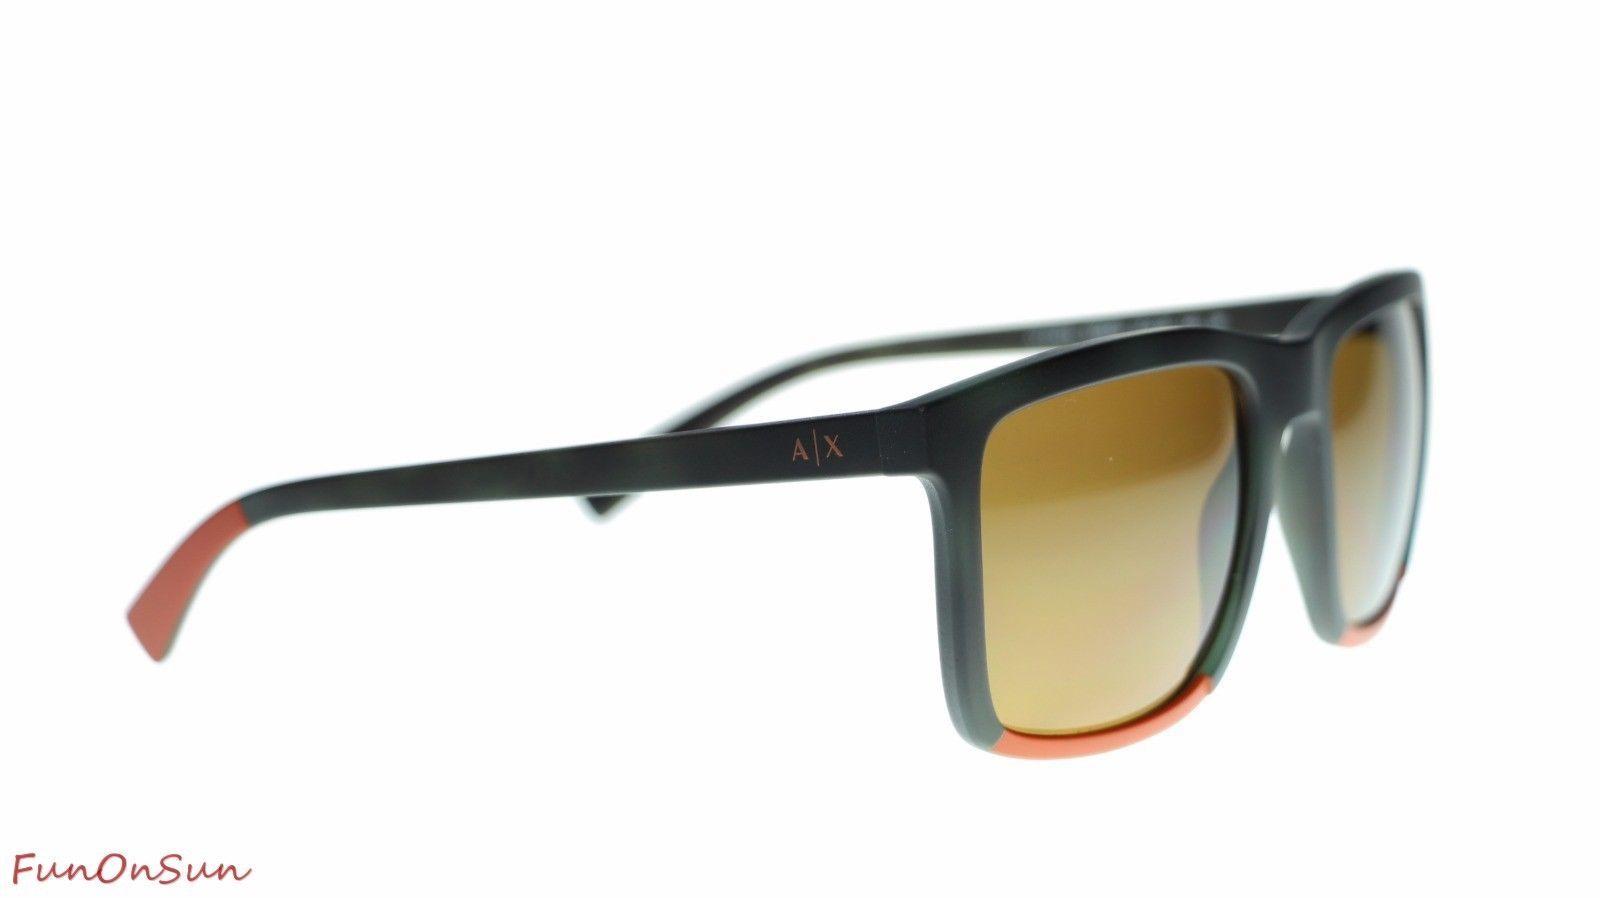 Armani Exchange Sunglasses AX4067 822883 Matte Havana Orange/Polar Brown Lens 55